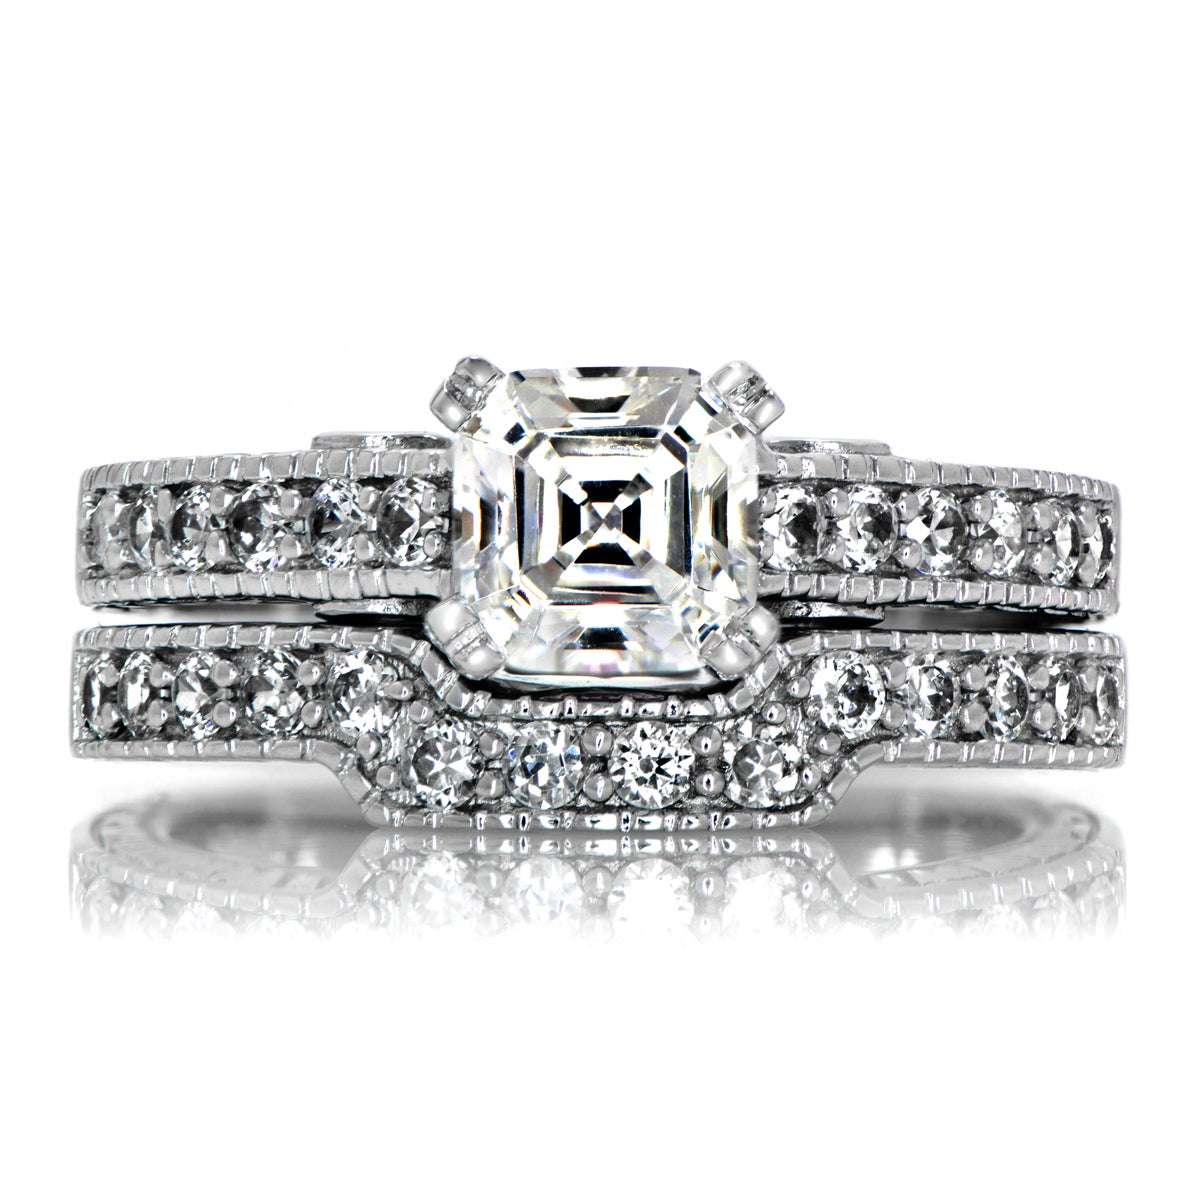 Sterling Silver Asscher Cut Cubic Zirconia Wedding Ring S...